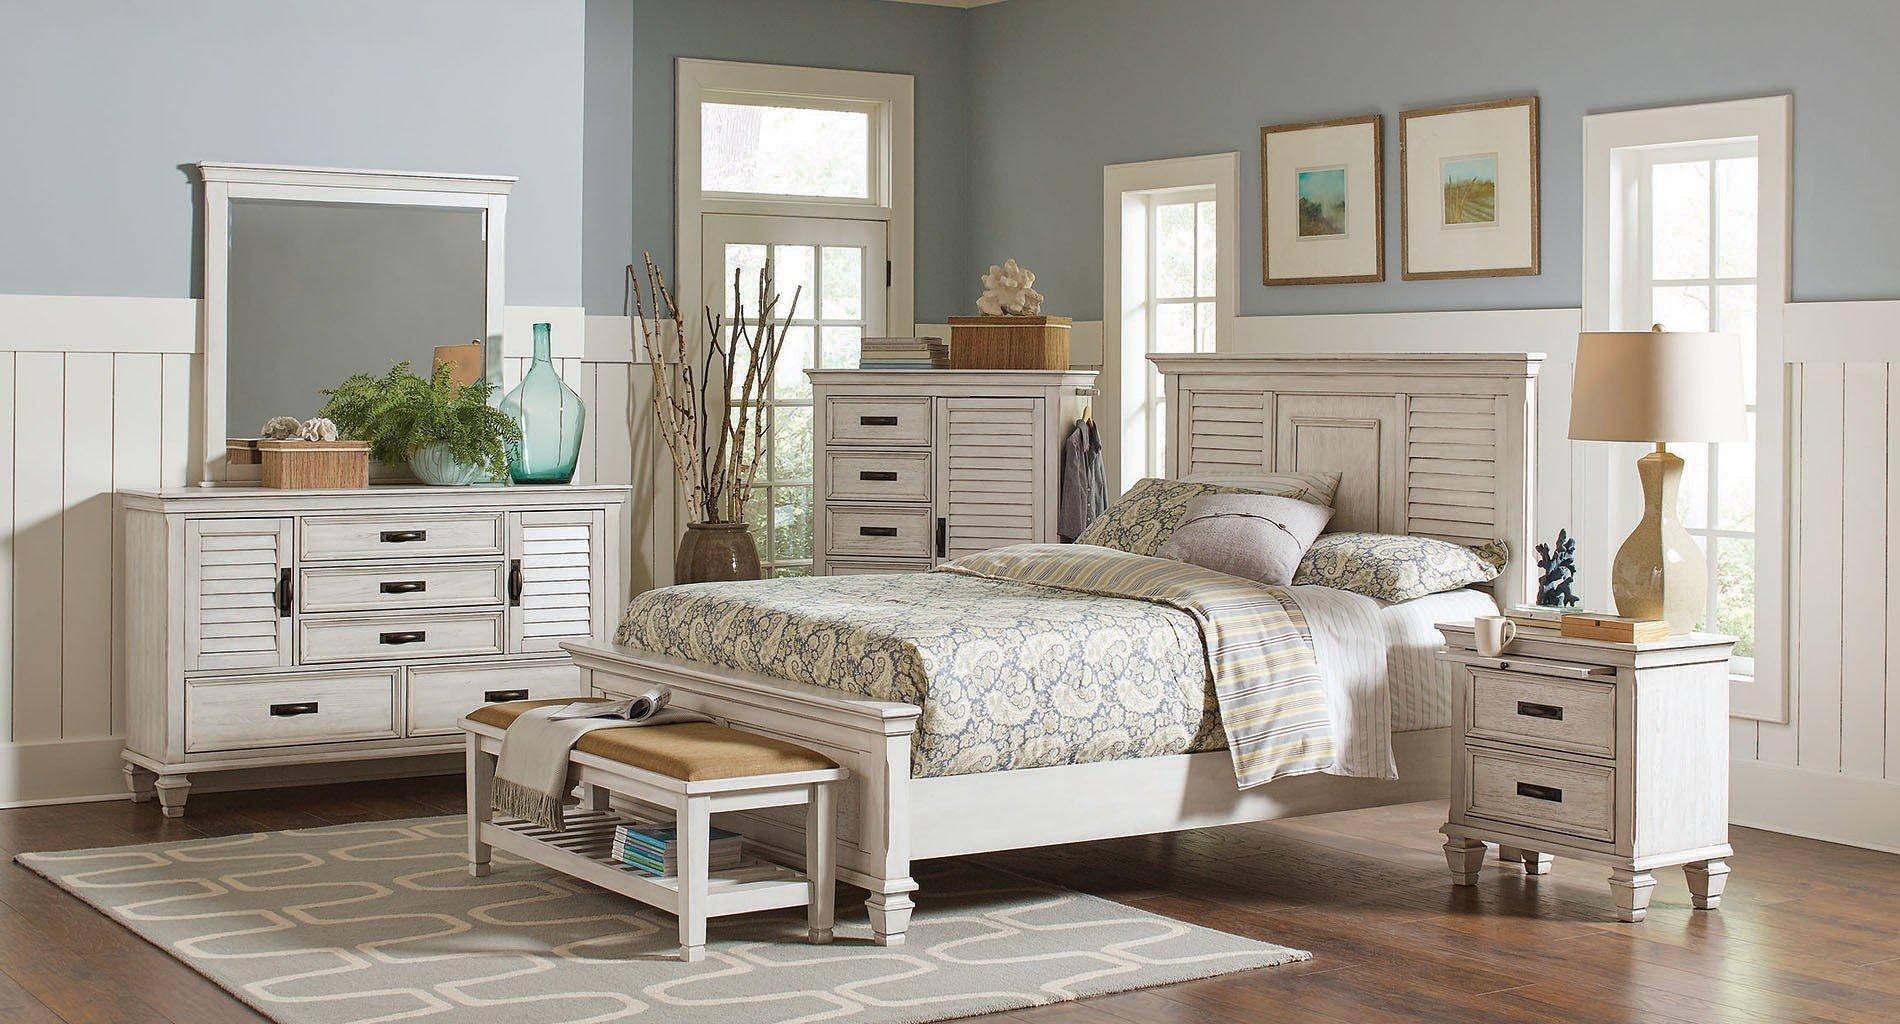 Liza panel bedroom set coaster furniture 2 reviews furniture cart for Coaster bedroom furniture reviews